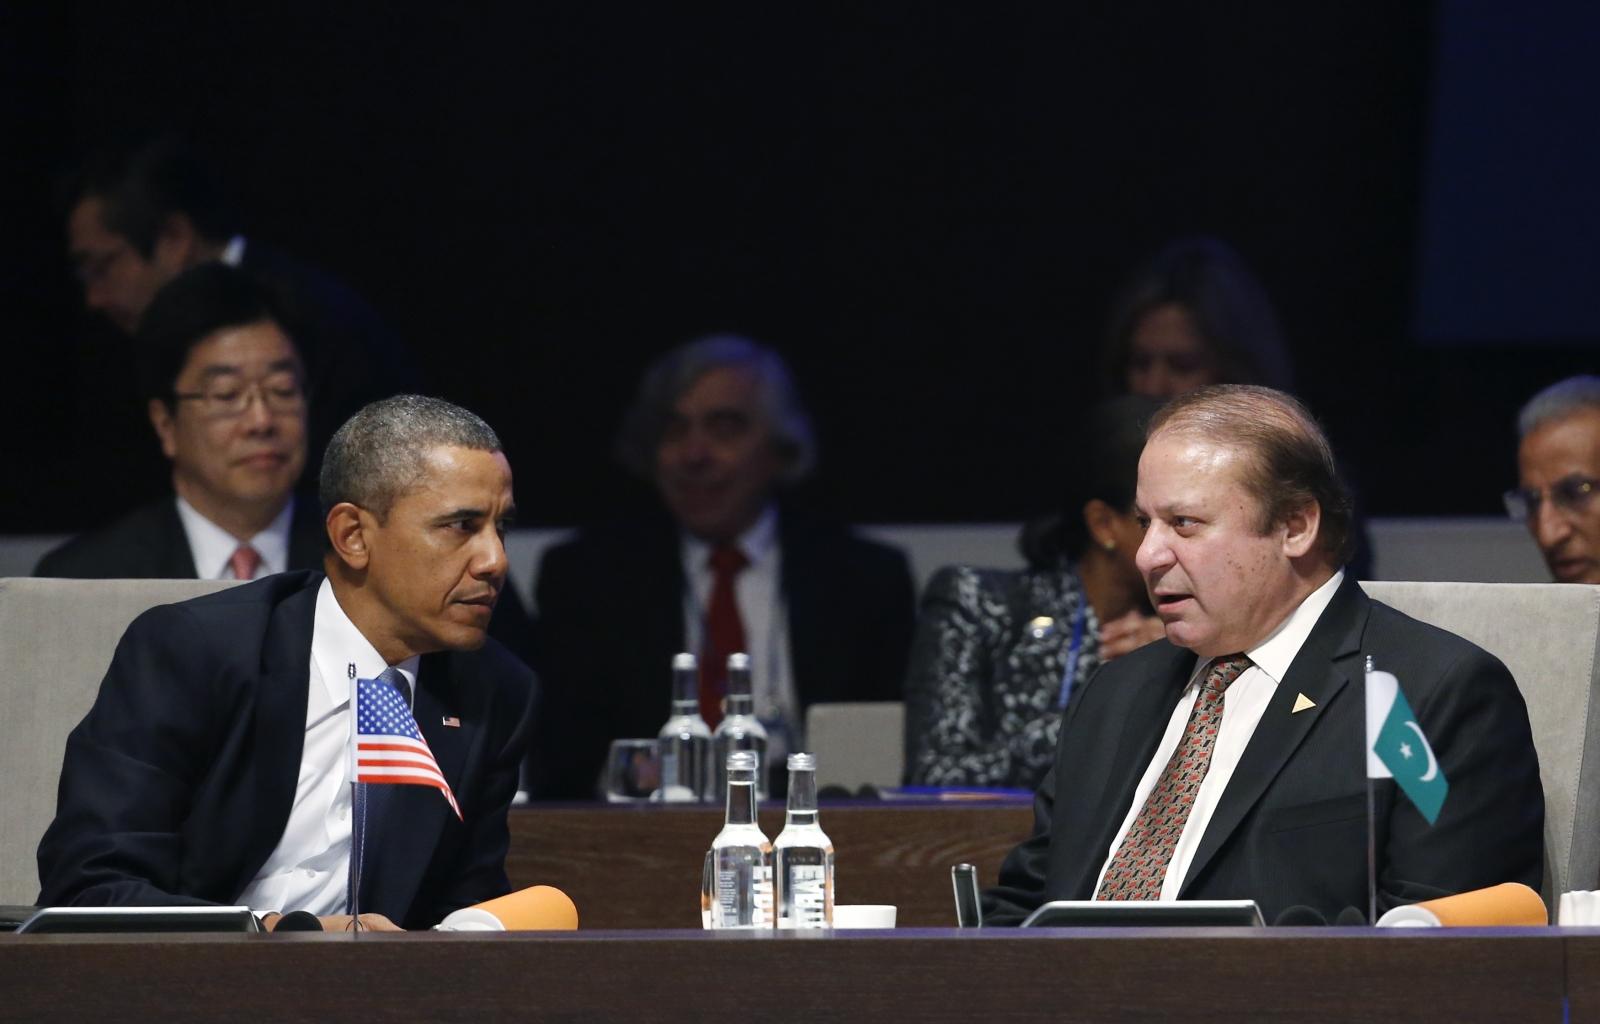 Obama and Pakistan Prime Minister